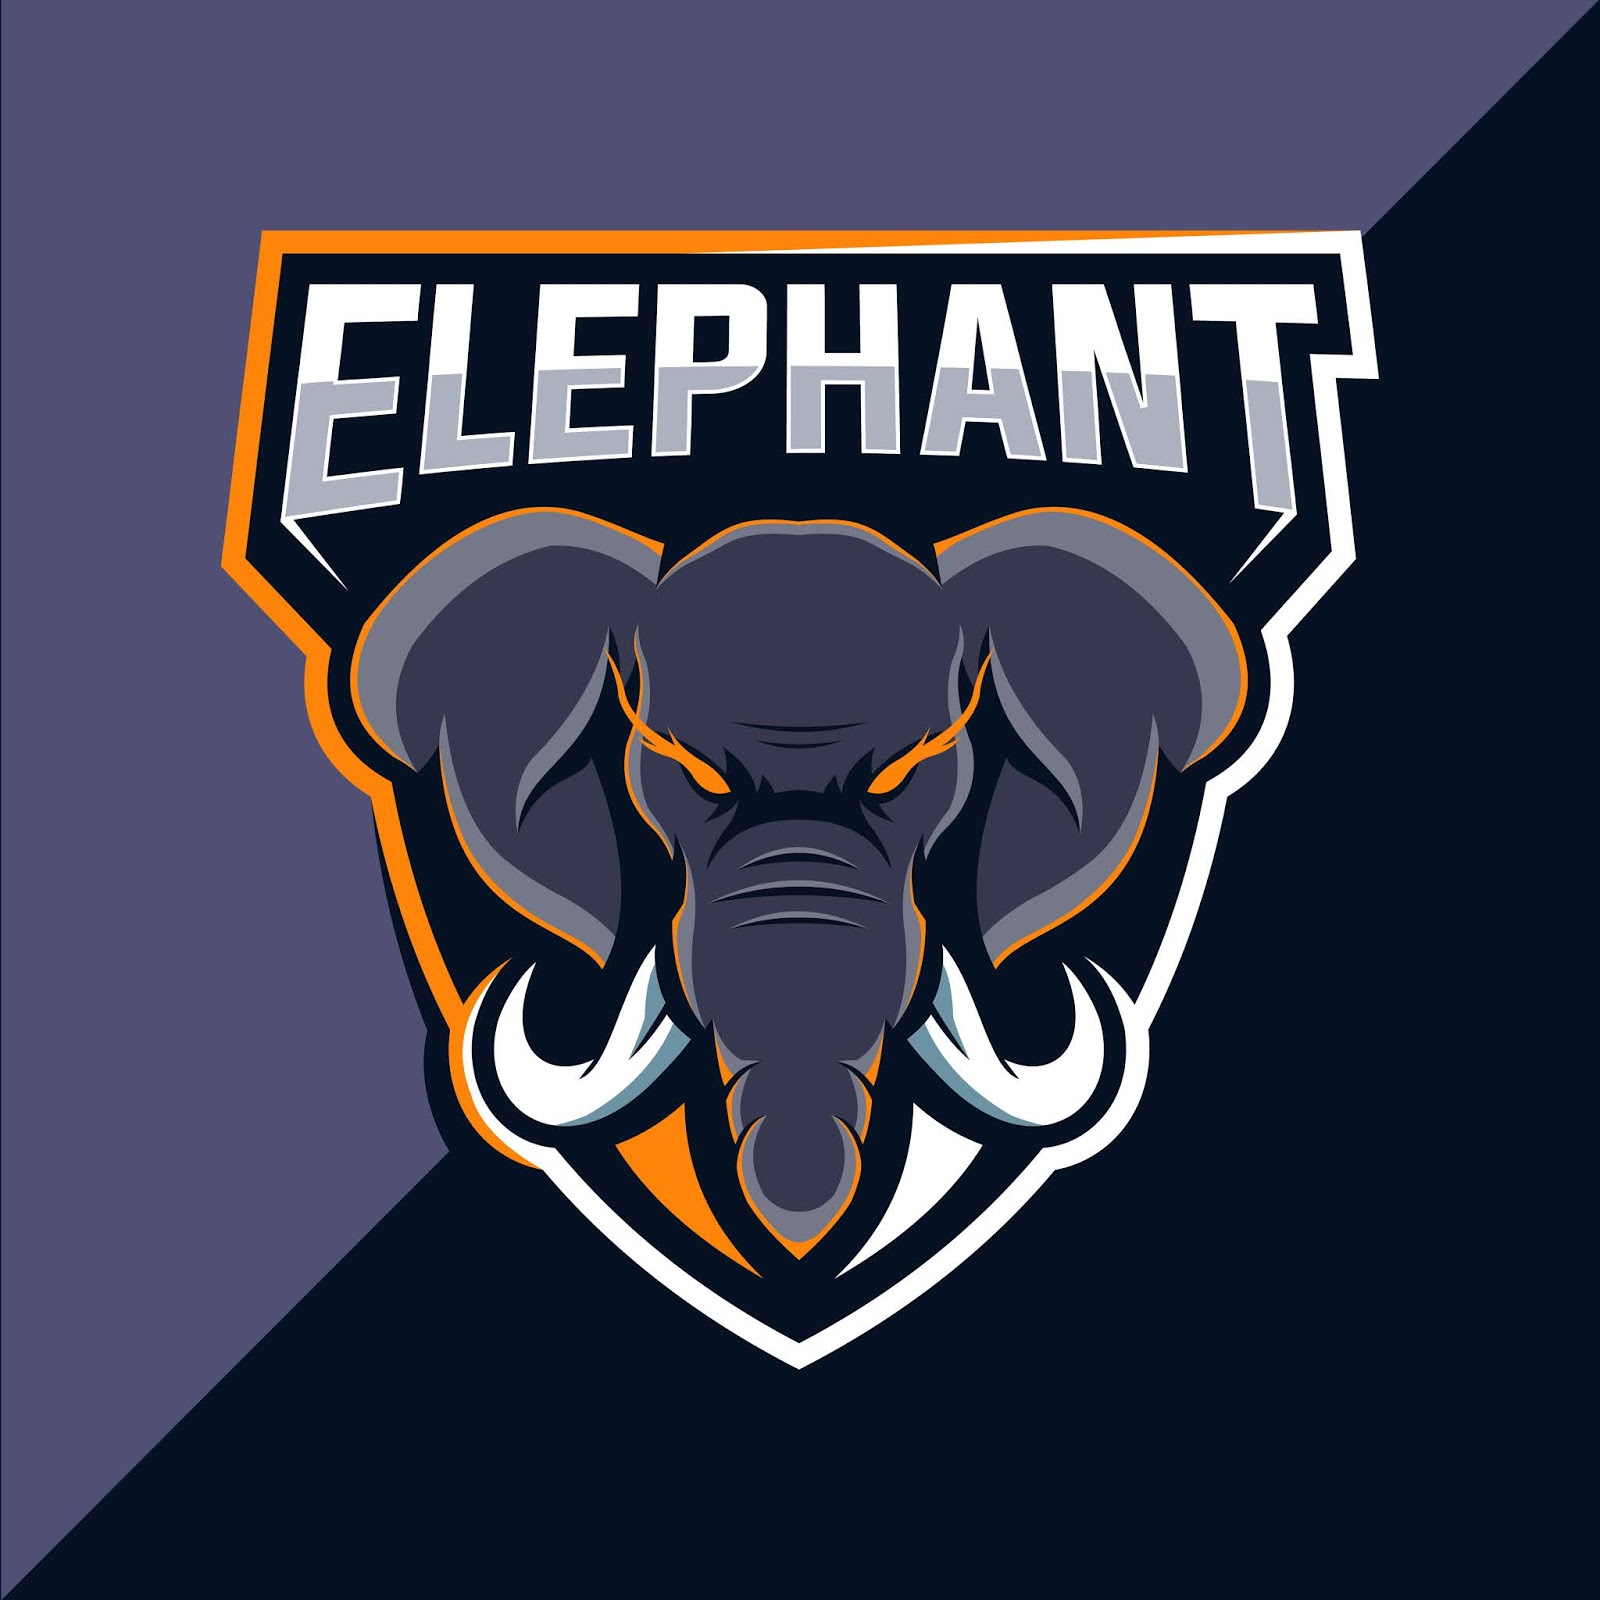 Elephant Mascot Esport Logo Design Free Download Vector CDR, AI, EPS and PNG Formats